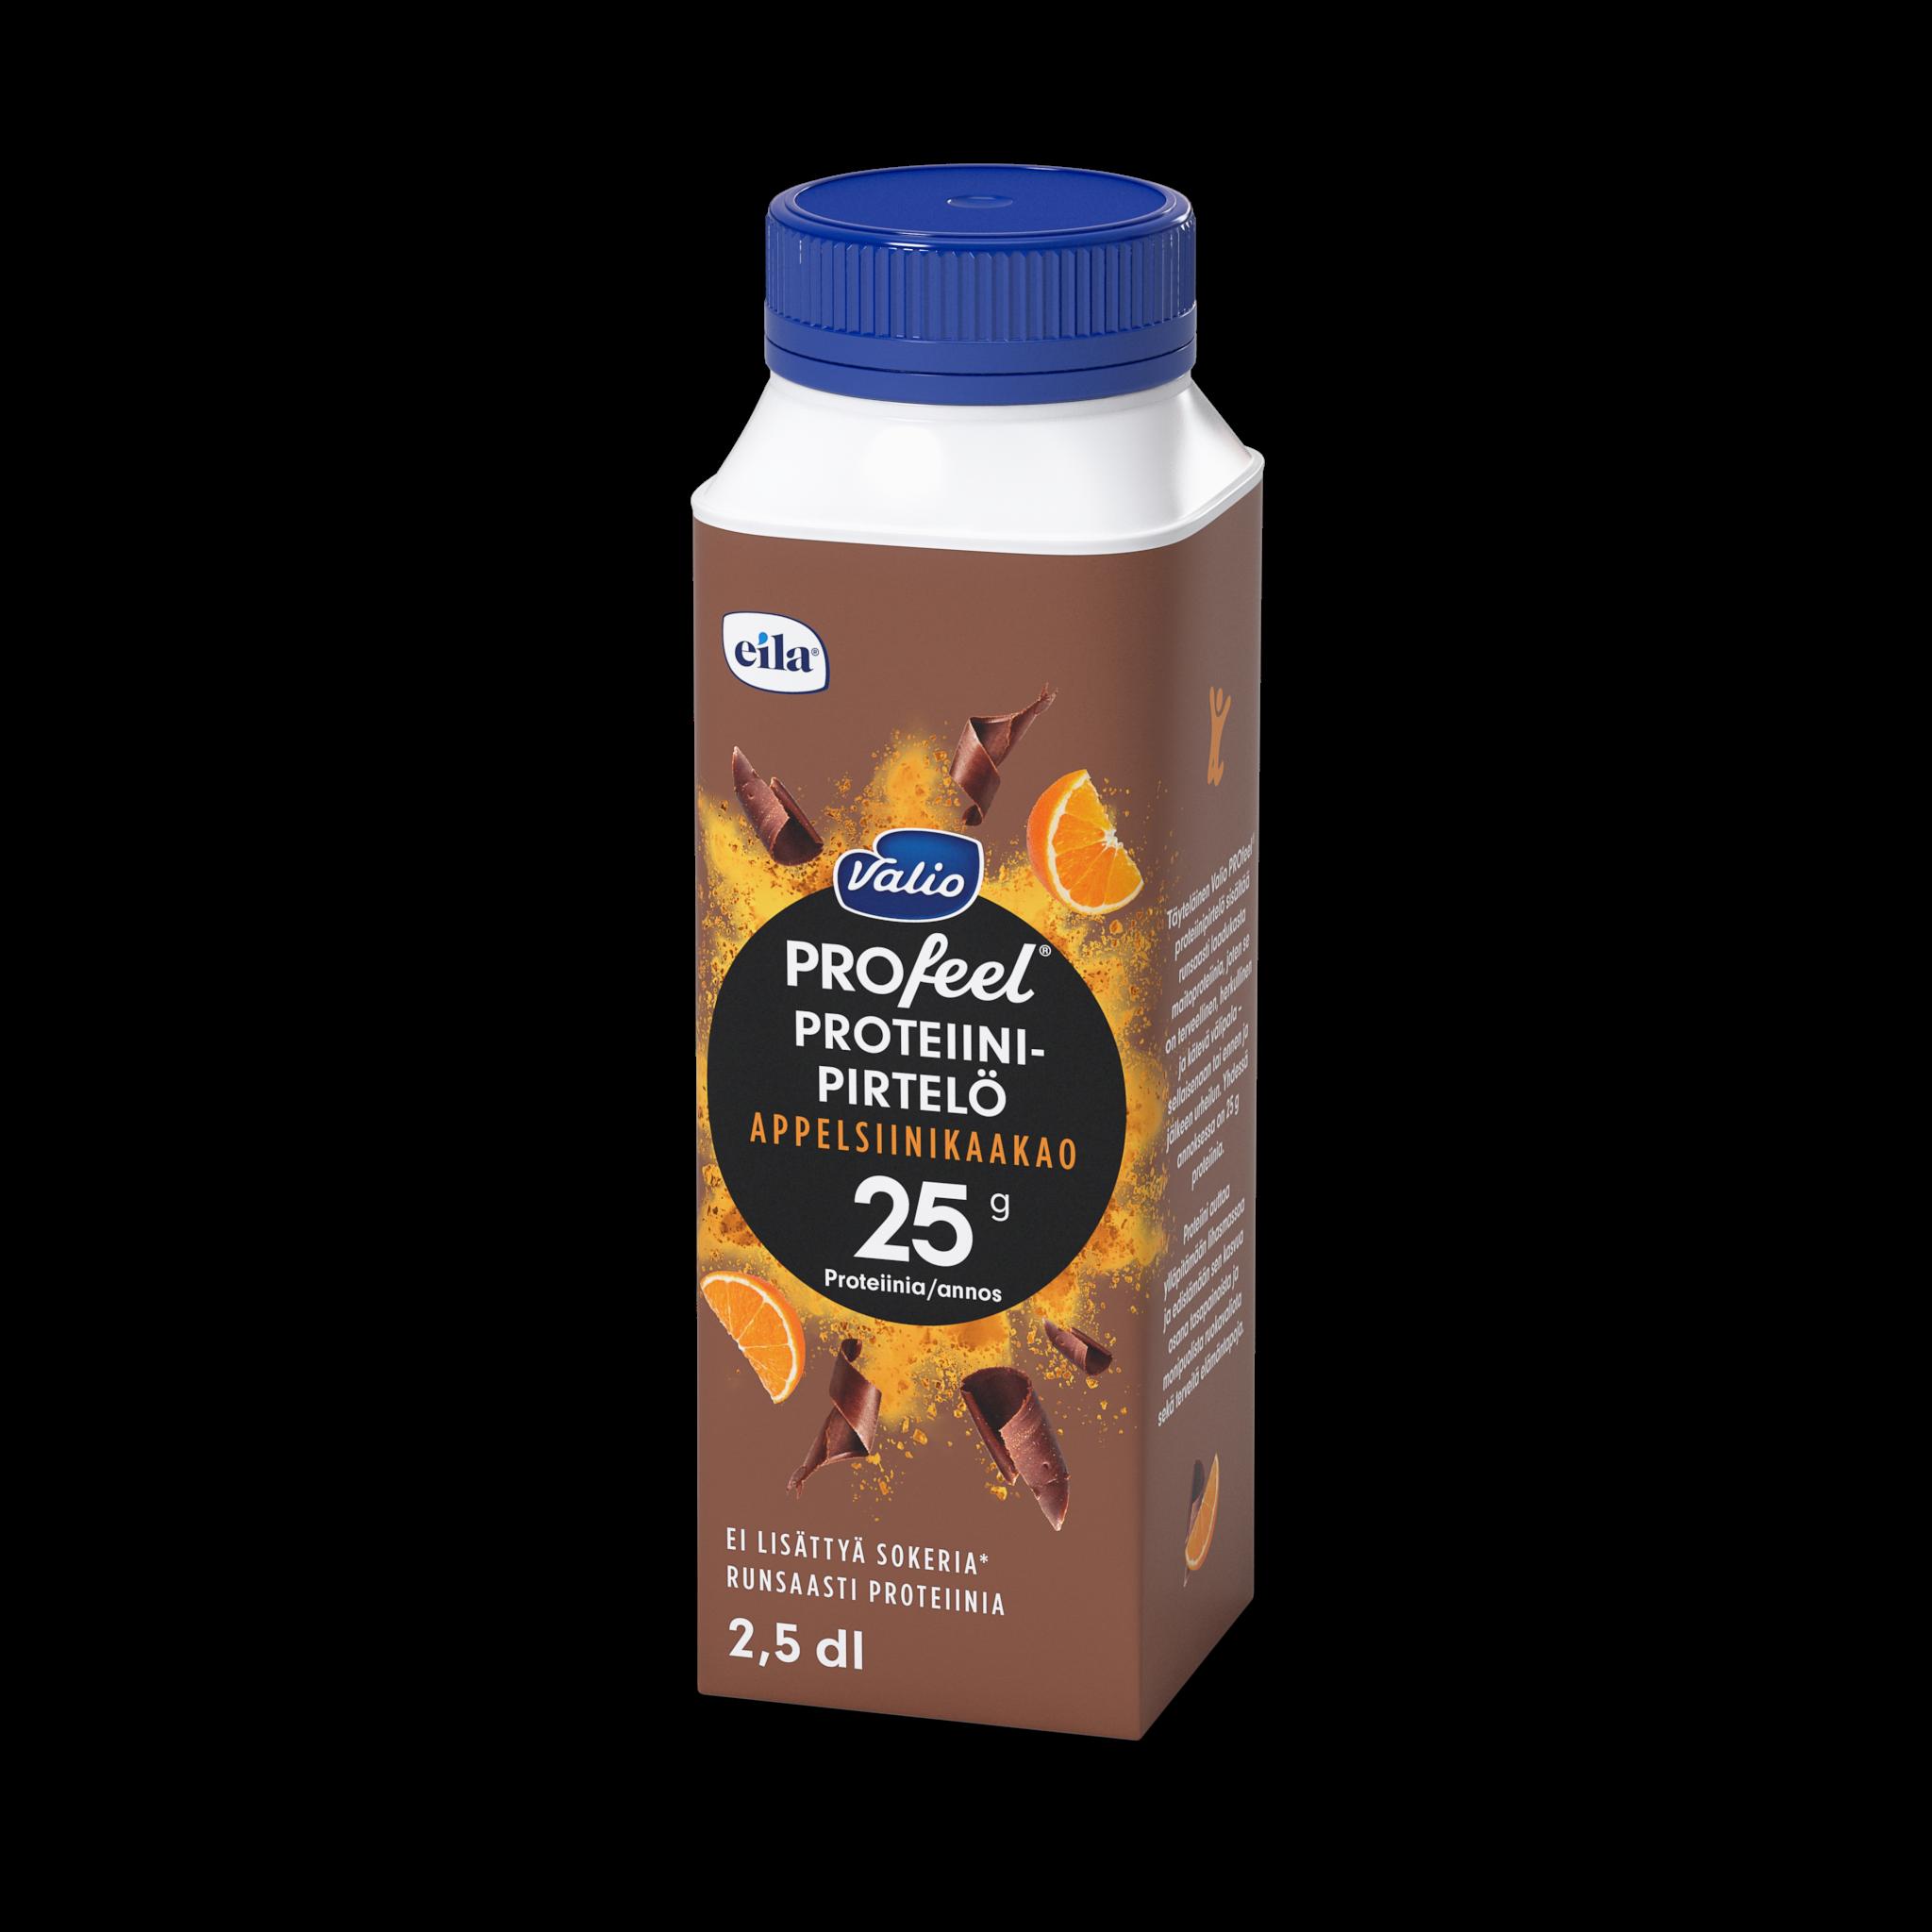 Valio PROfeel® proteiinipirtelö appelsiinikaakao laktoositon